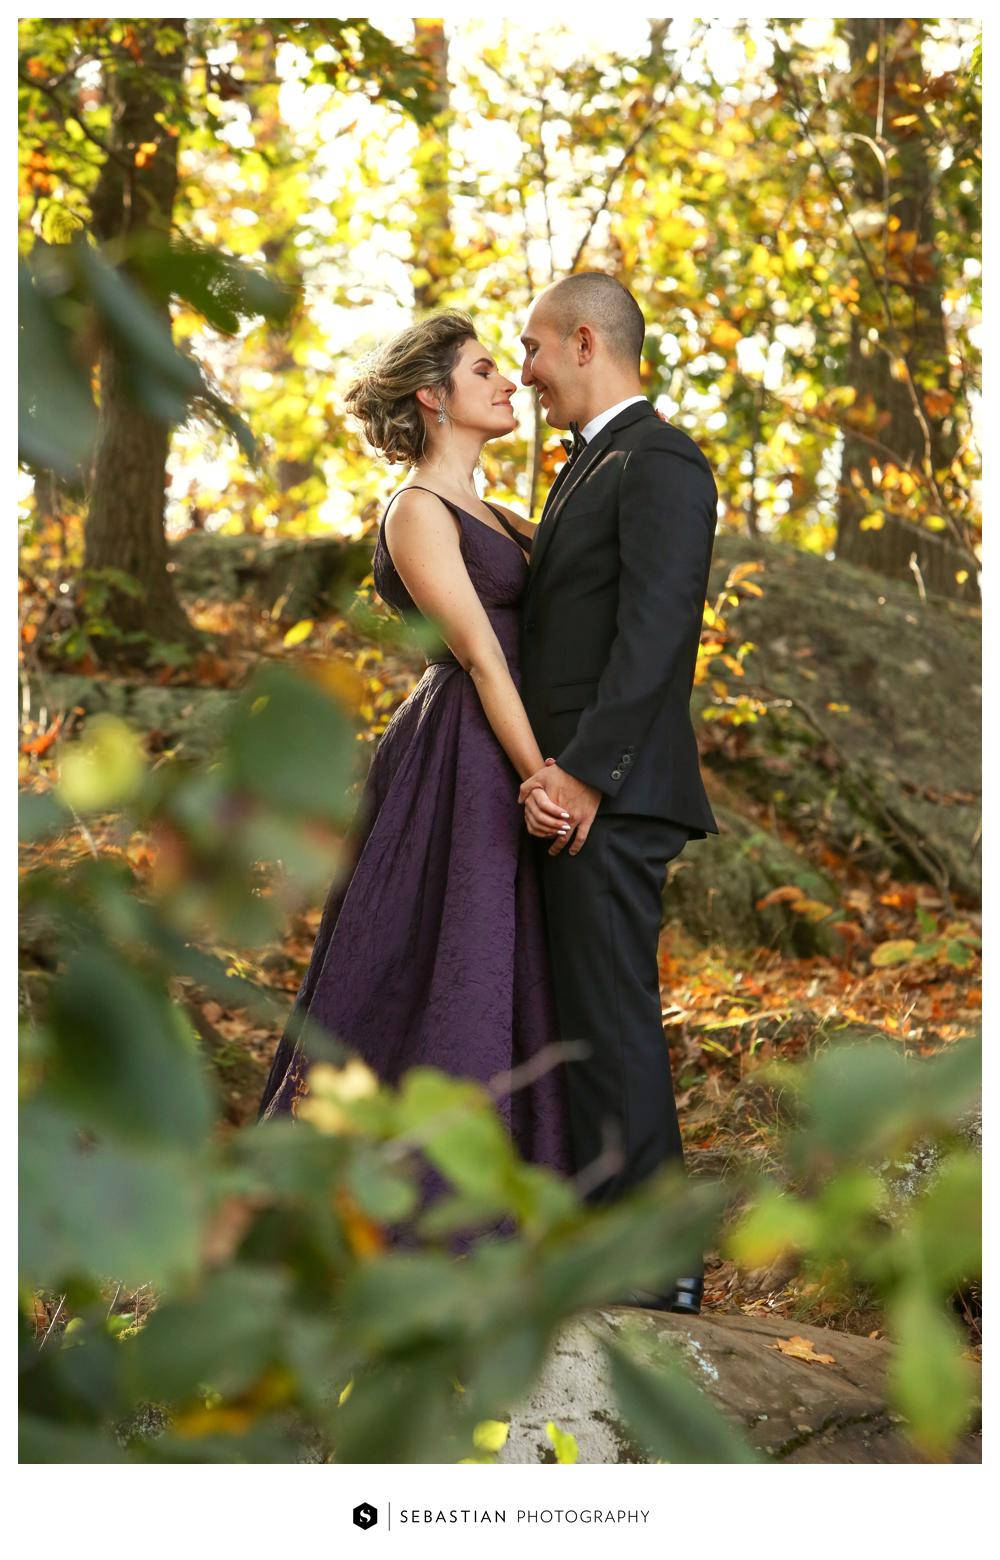 Sebastian Photography_CT Wedding Photographer_Castle Craig_CT Engagement Photographer_1006.jpg